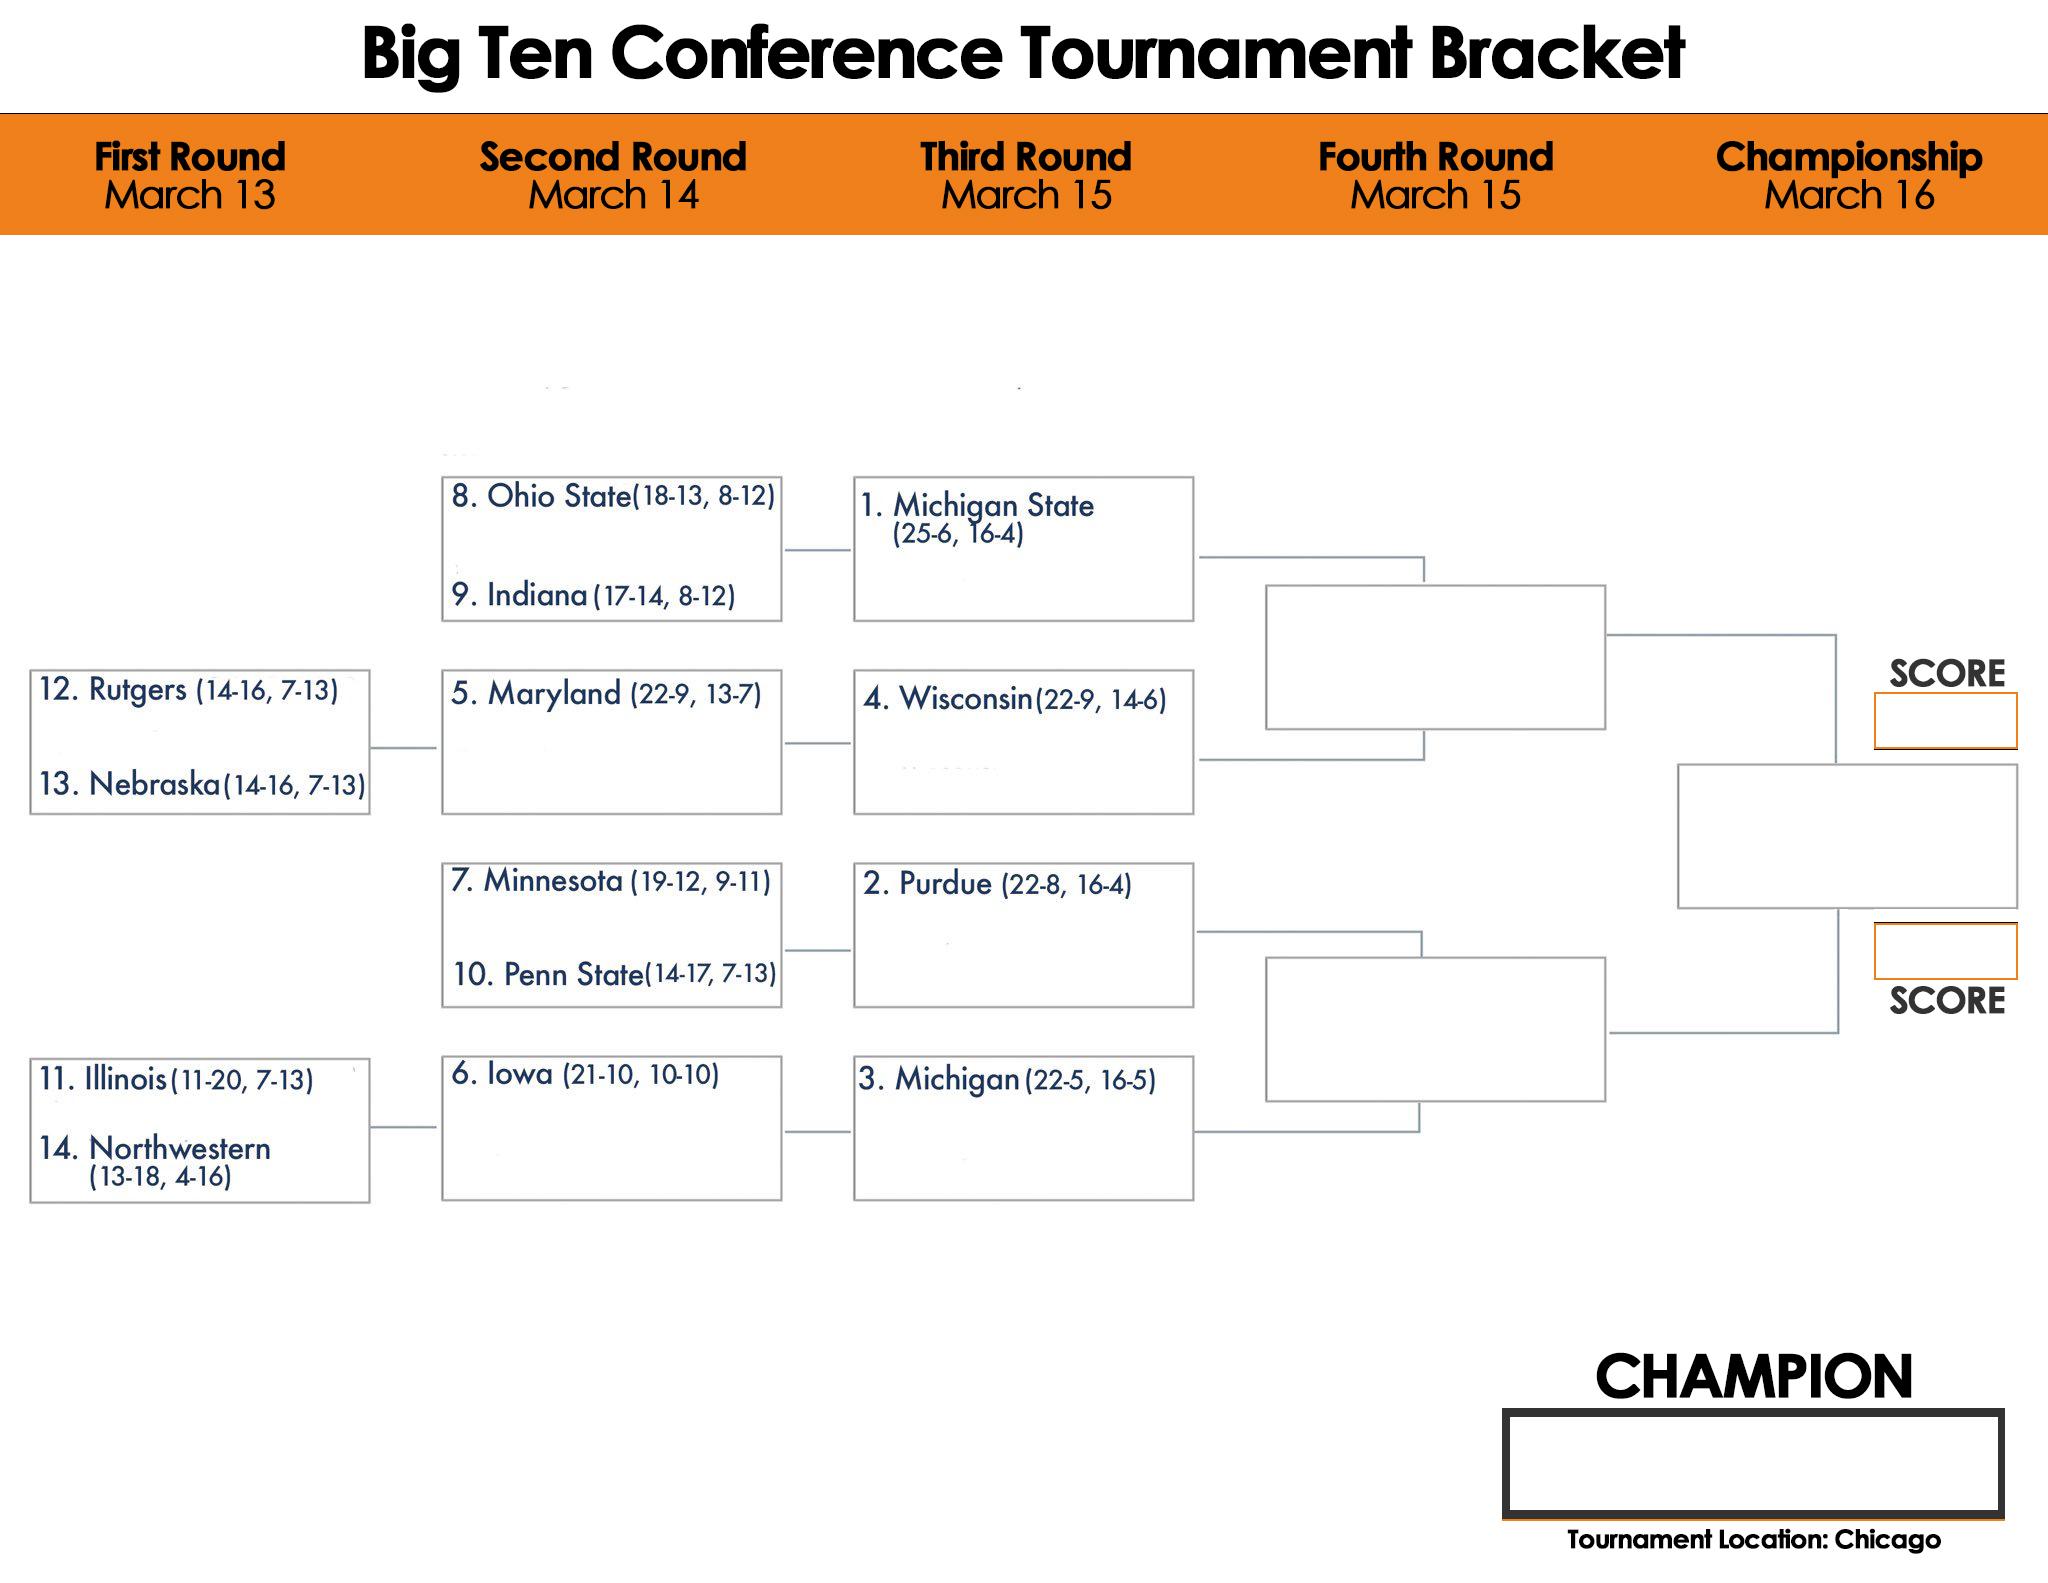 2019 Big Ten Conference Championship Bracket